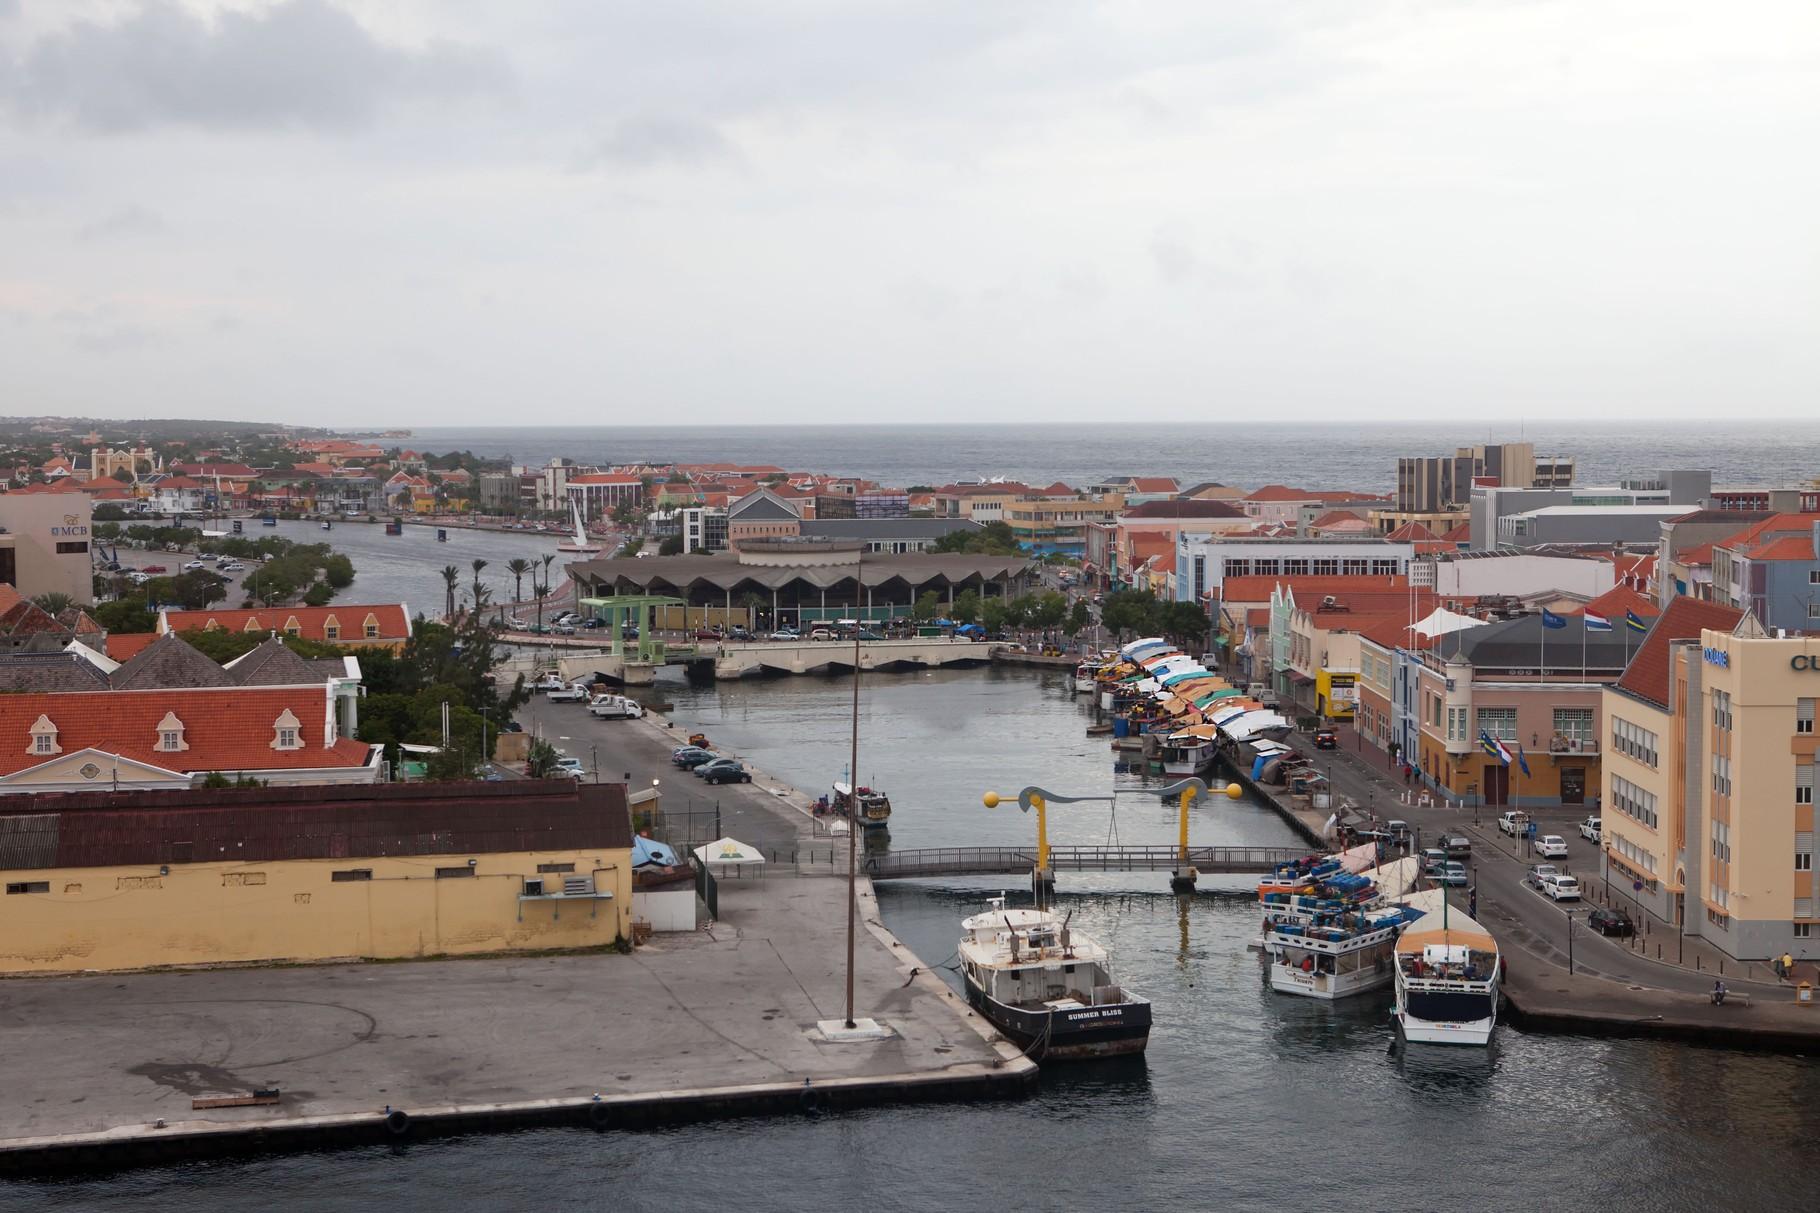 Curaçao Willemstad